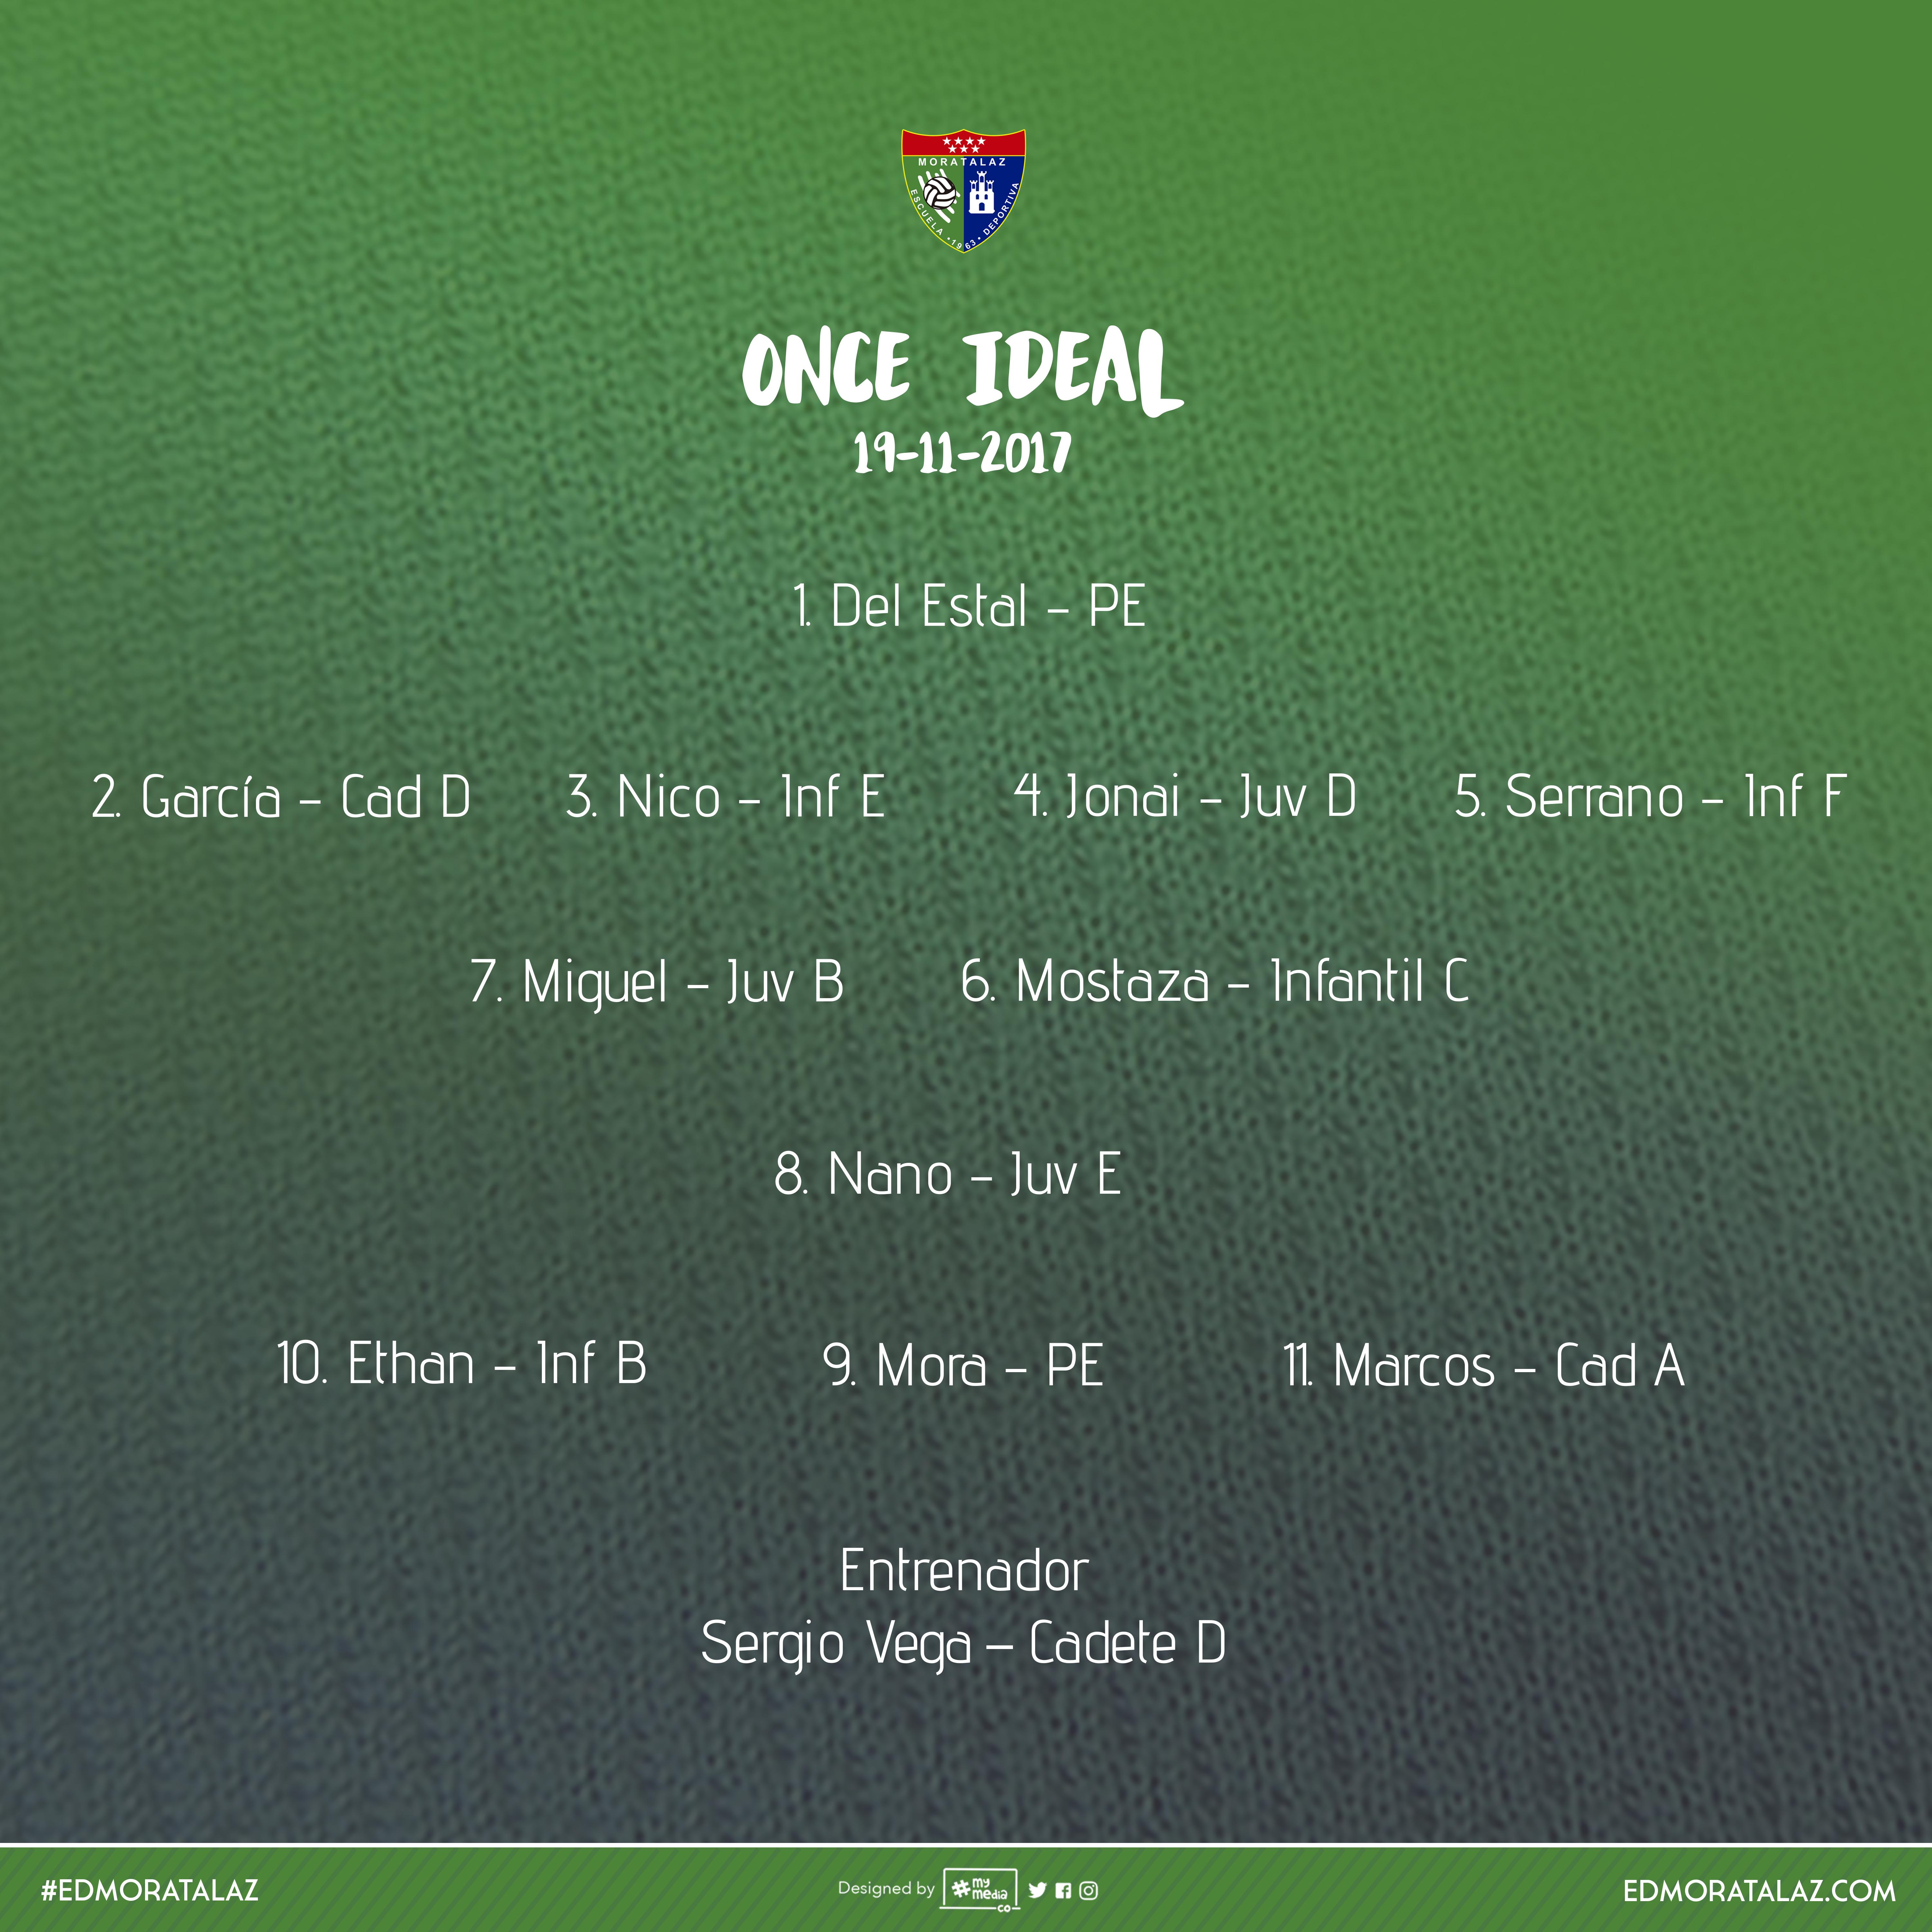 Once ideal del fin de semana 18-19 de noviembre, Temporada 2017/18